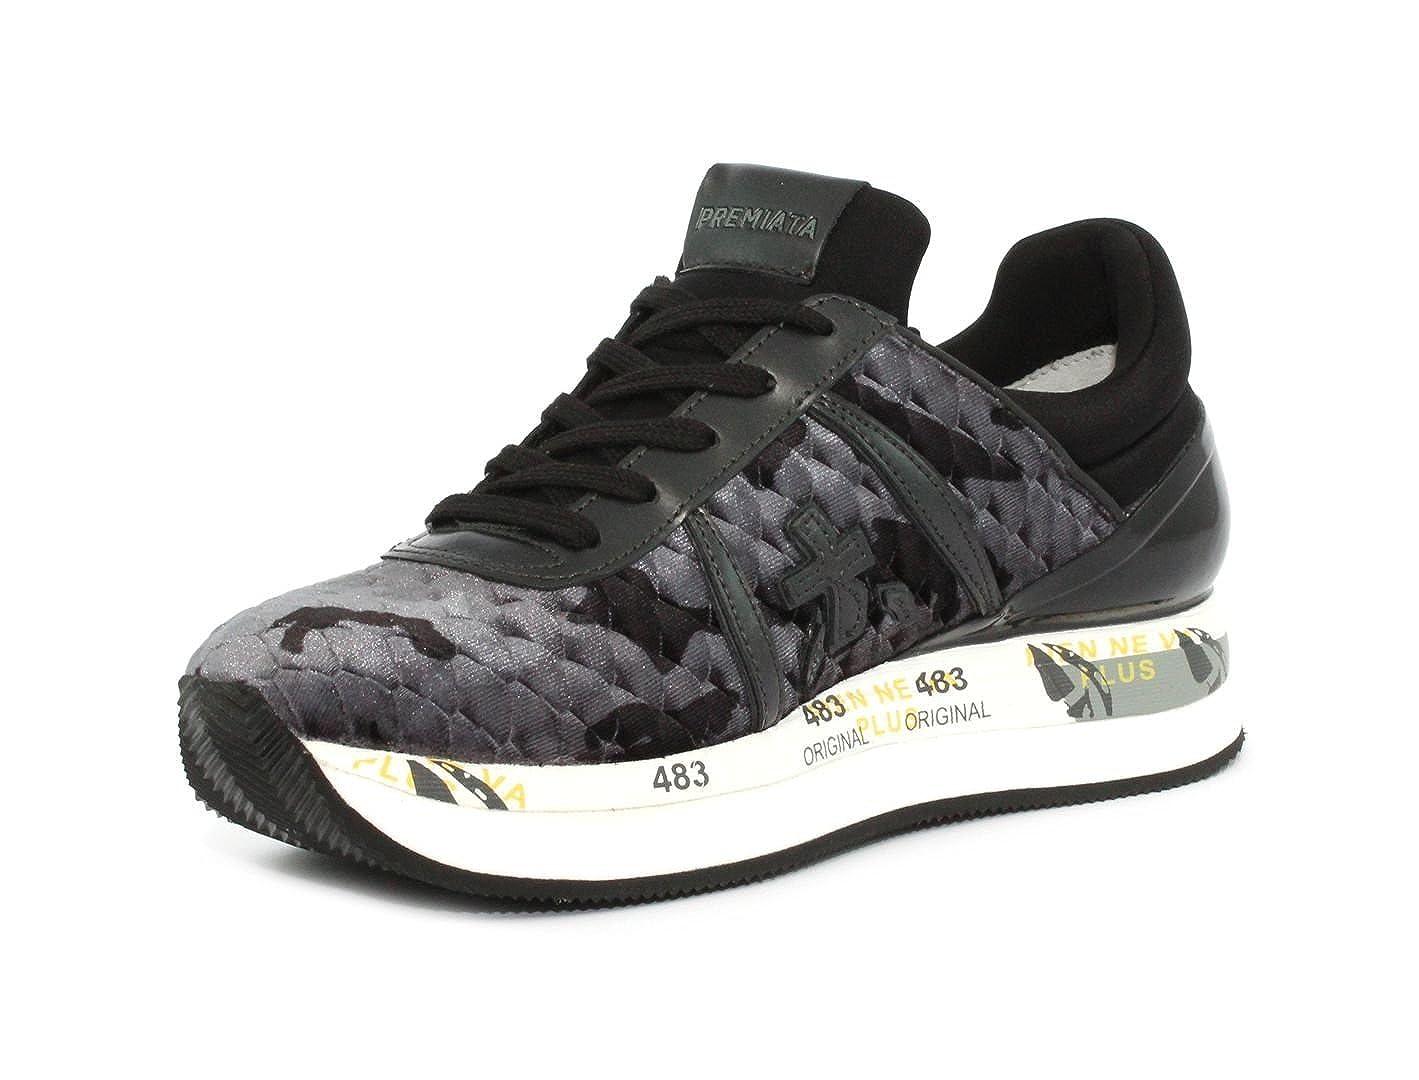 PREMIATA Sneaker Liz 3537 3537 3537 - 1f53b2